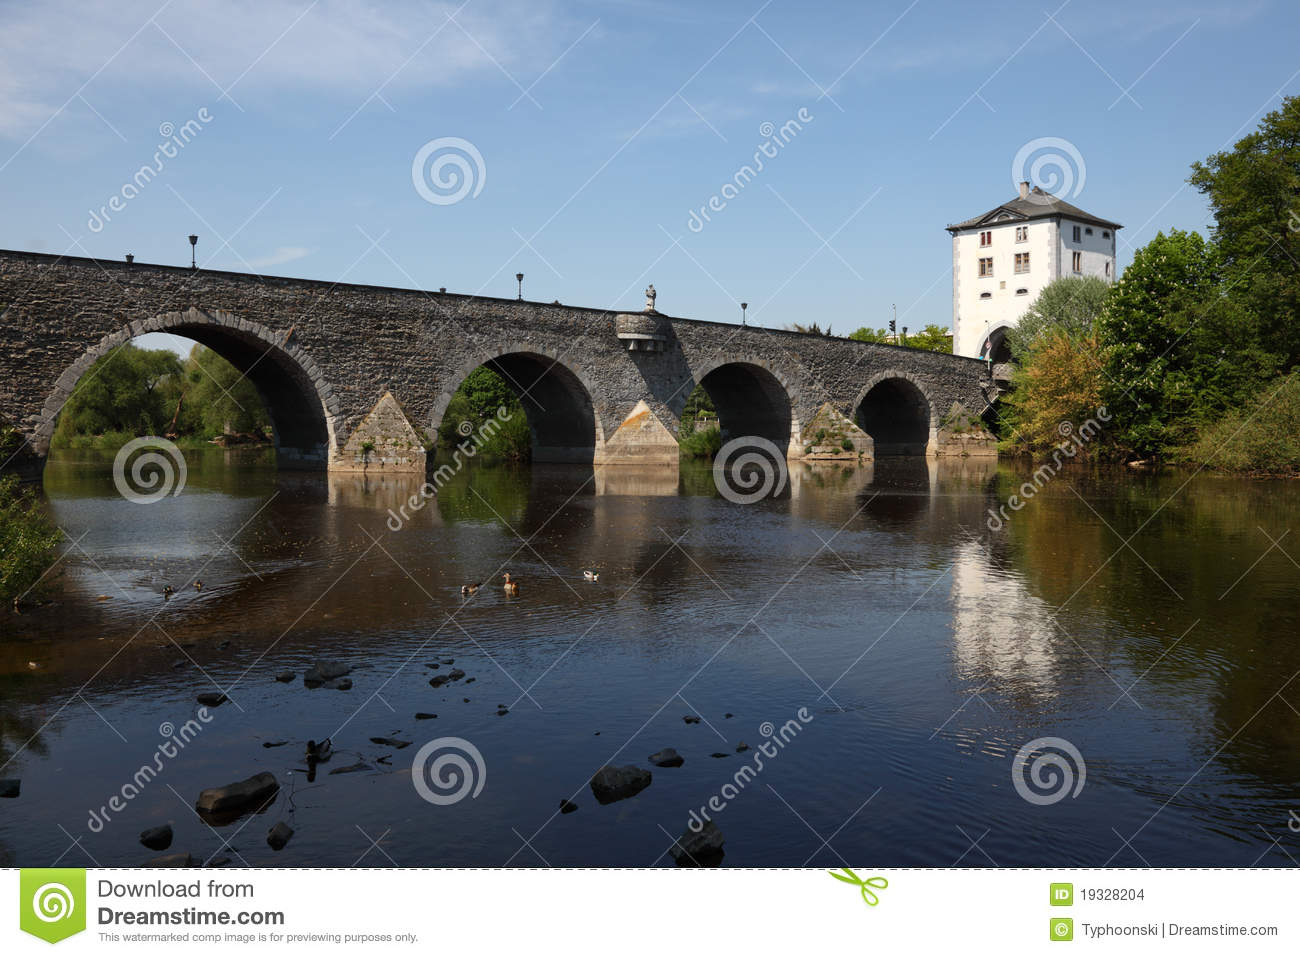 Bridge In Limburg, Germany Stock Images.